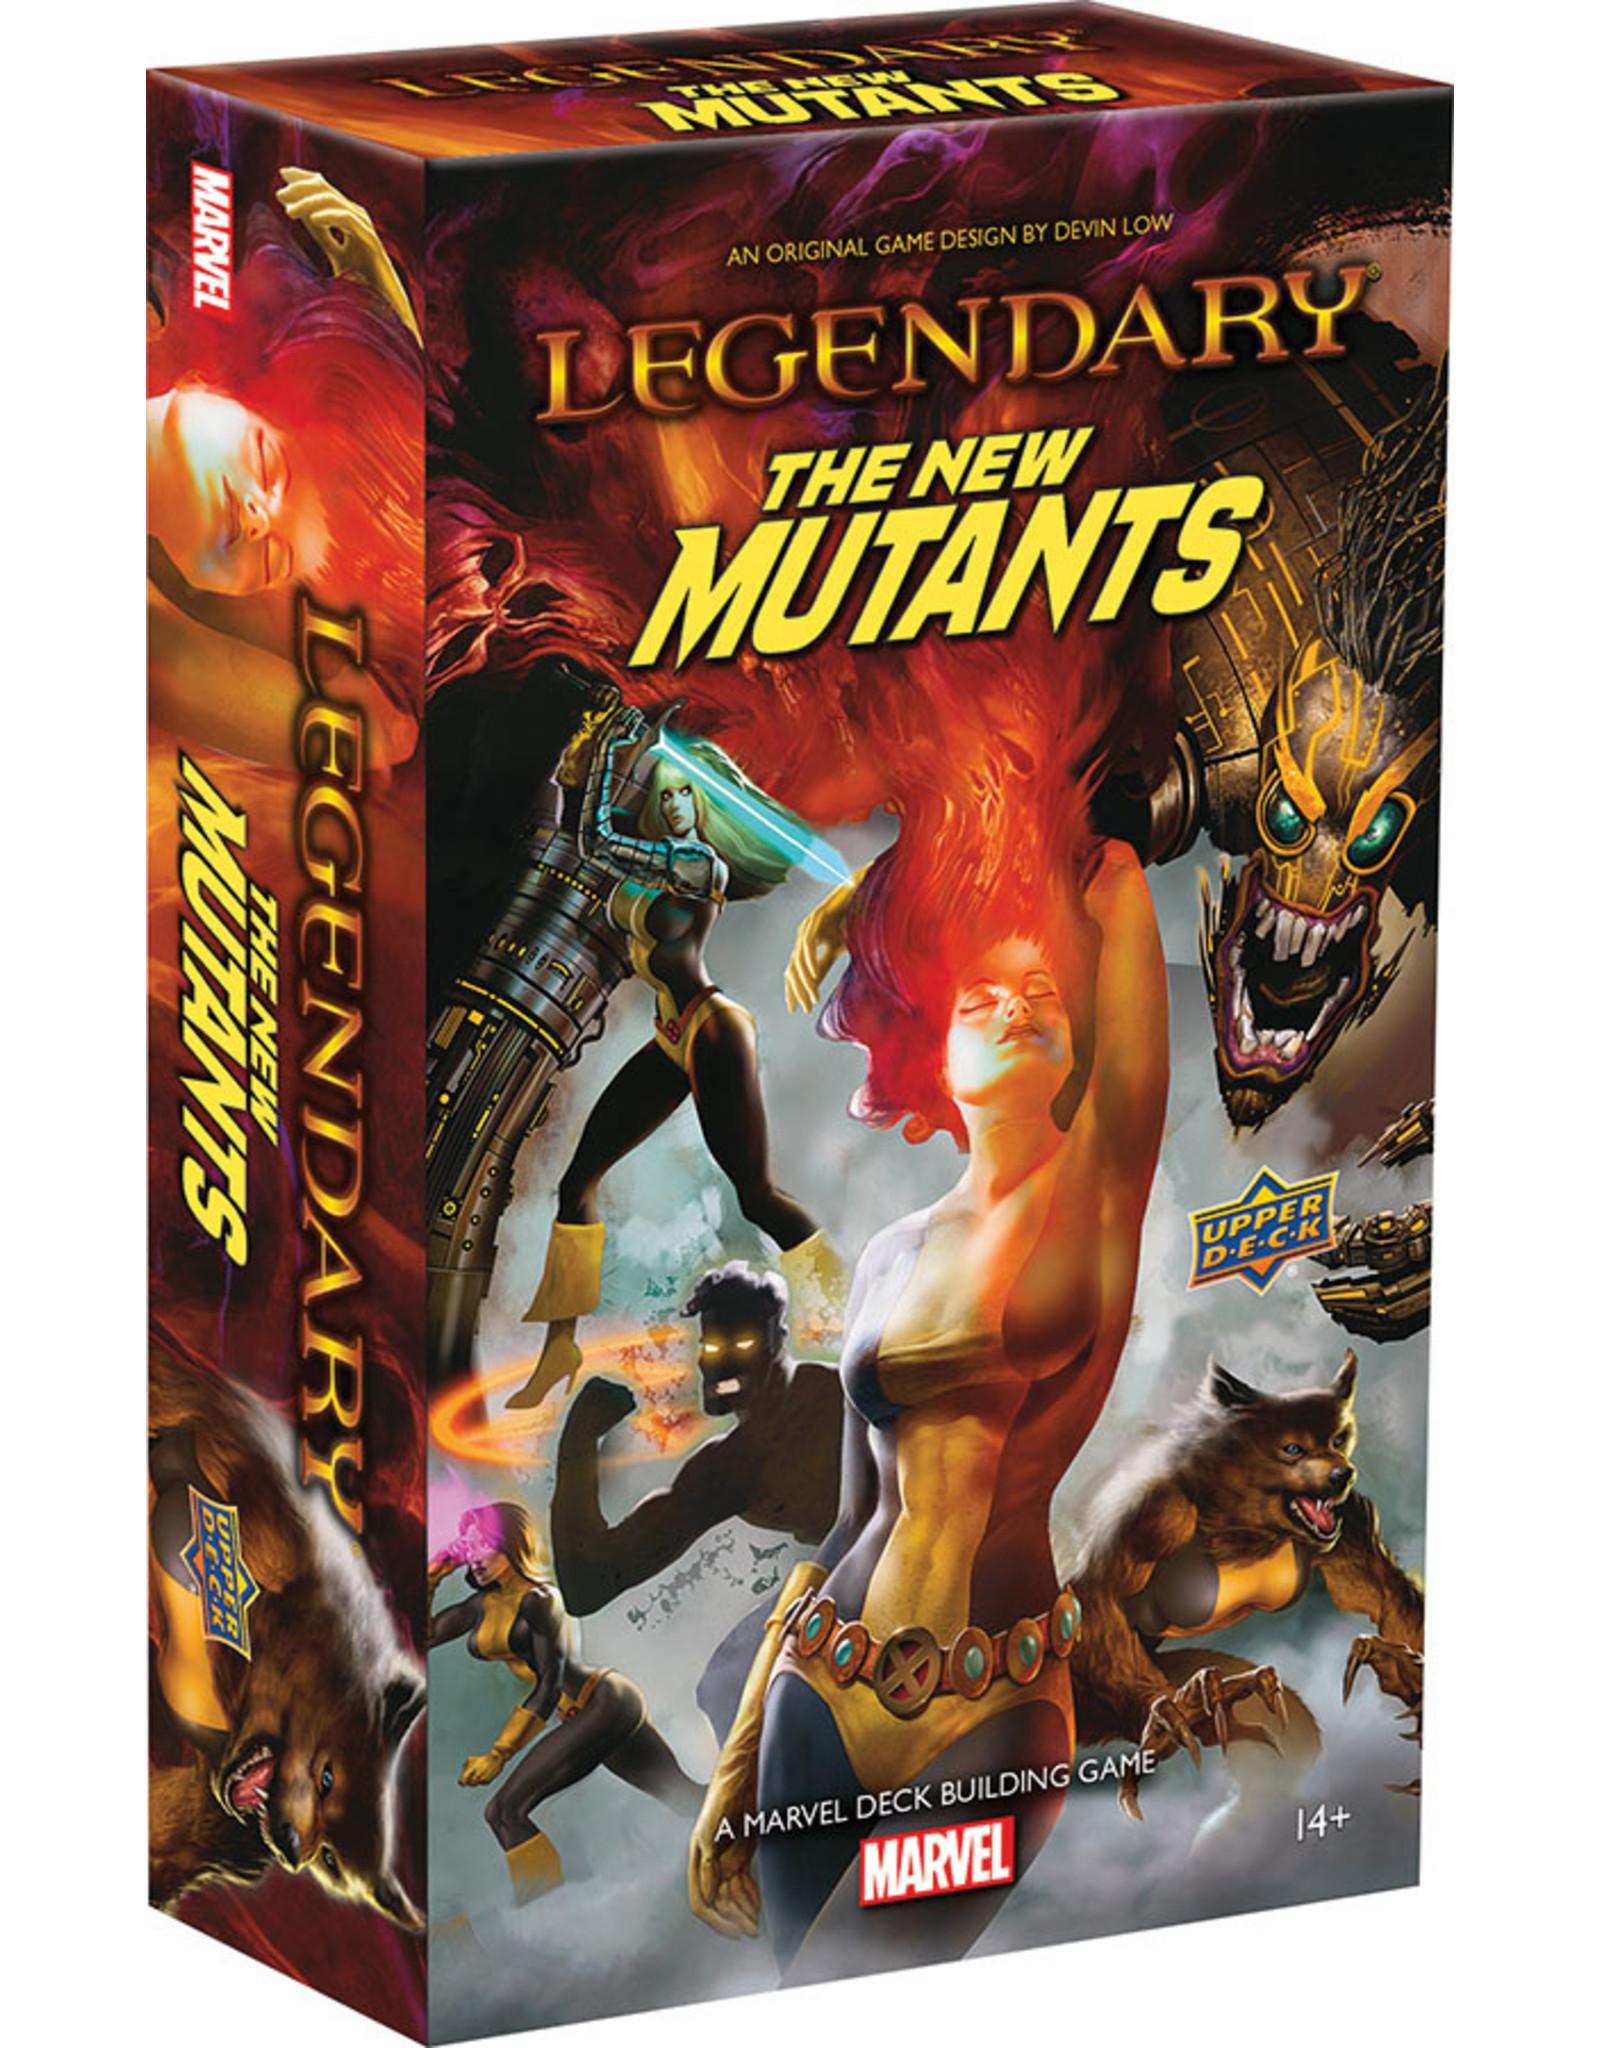 Upper Deck Legendary DBG: Marvel - The New Mutants Expansion